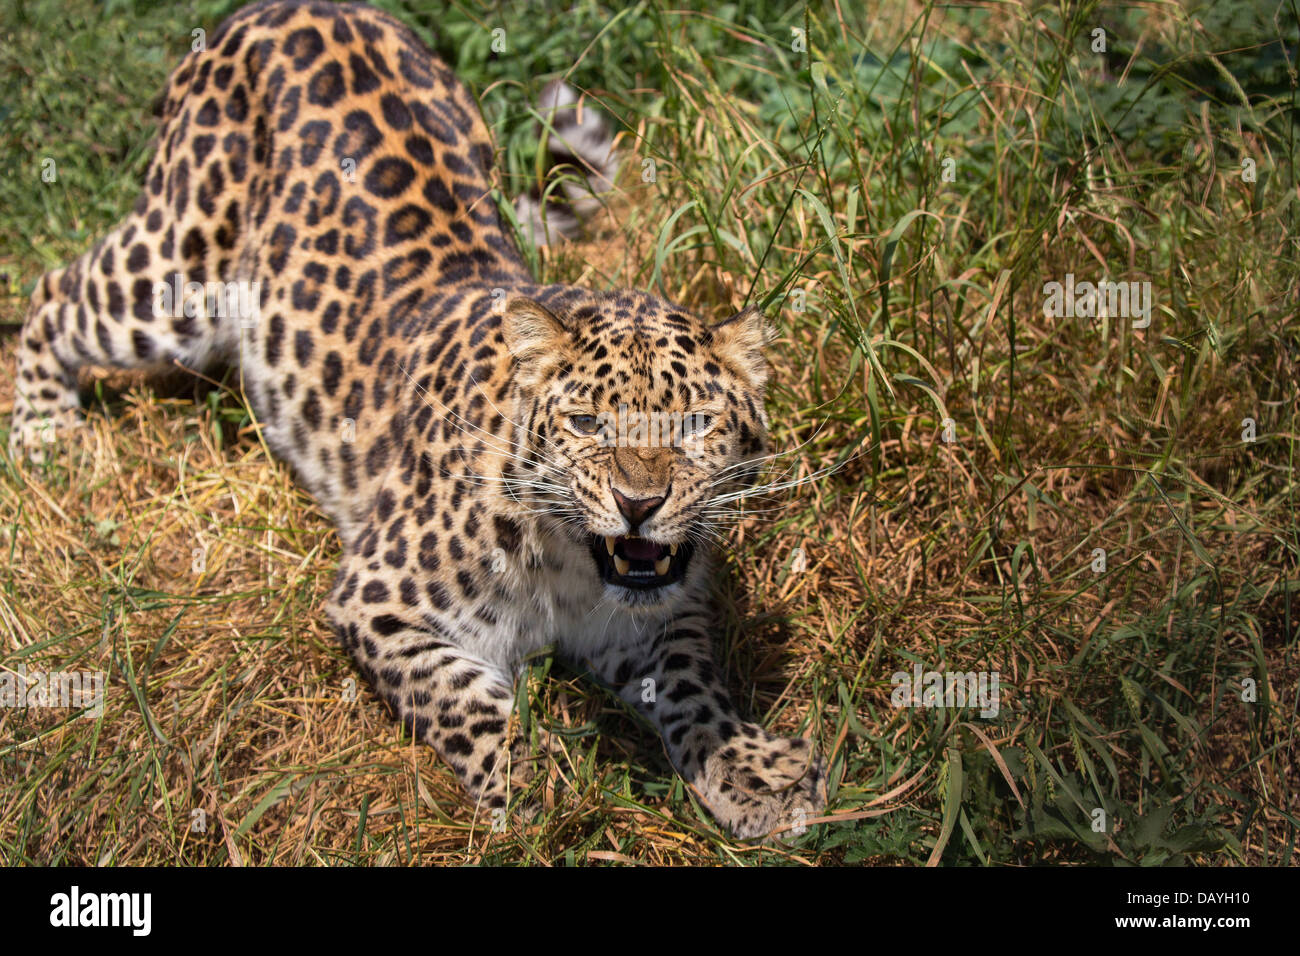 Amur Leopard, growling - Stock Image